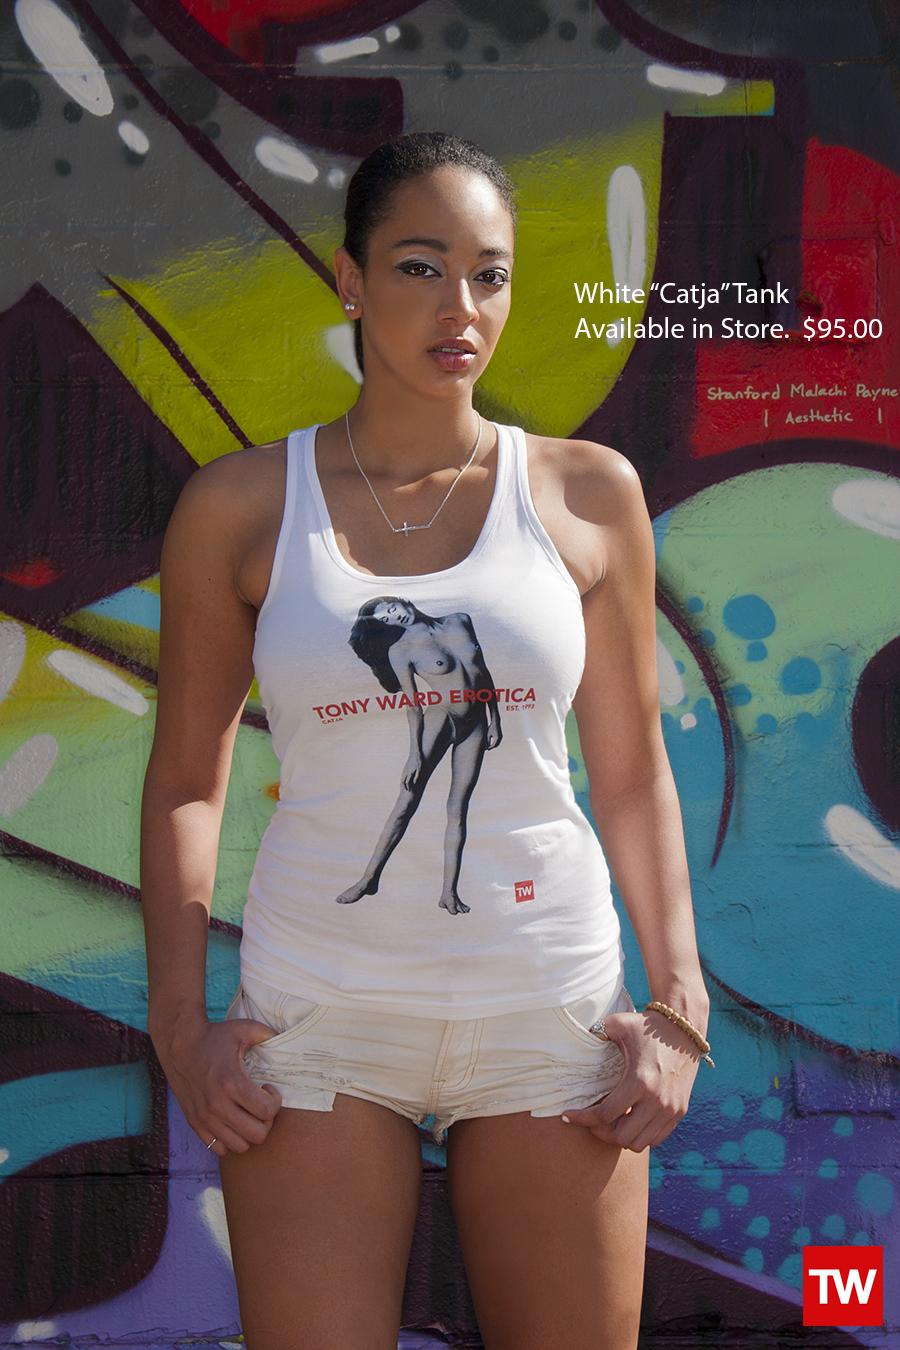 Tony_Ward_Studio_e_commerce_store_t-shirts_white_Catja_tank_sale_model_Chelsea